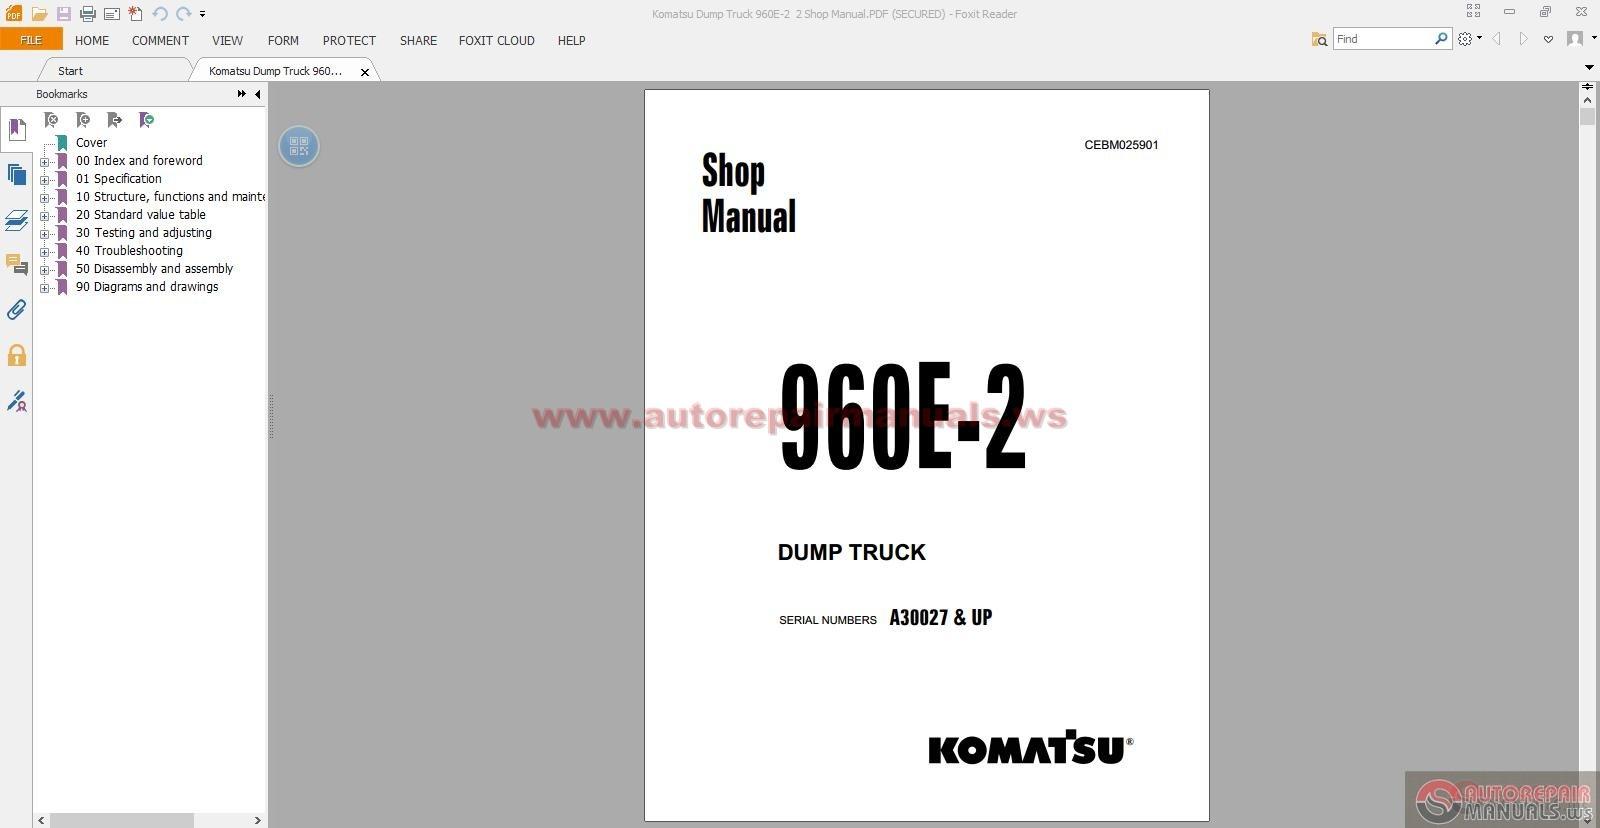 komatsu dump truck 960e 2 2 shop manual auto repair. Black Bedroom Furniture Sets. Home Design Ideas